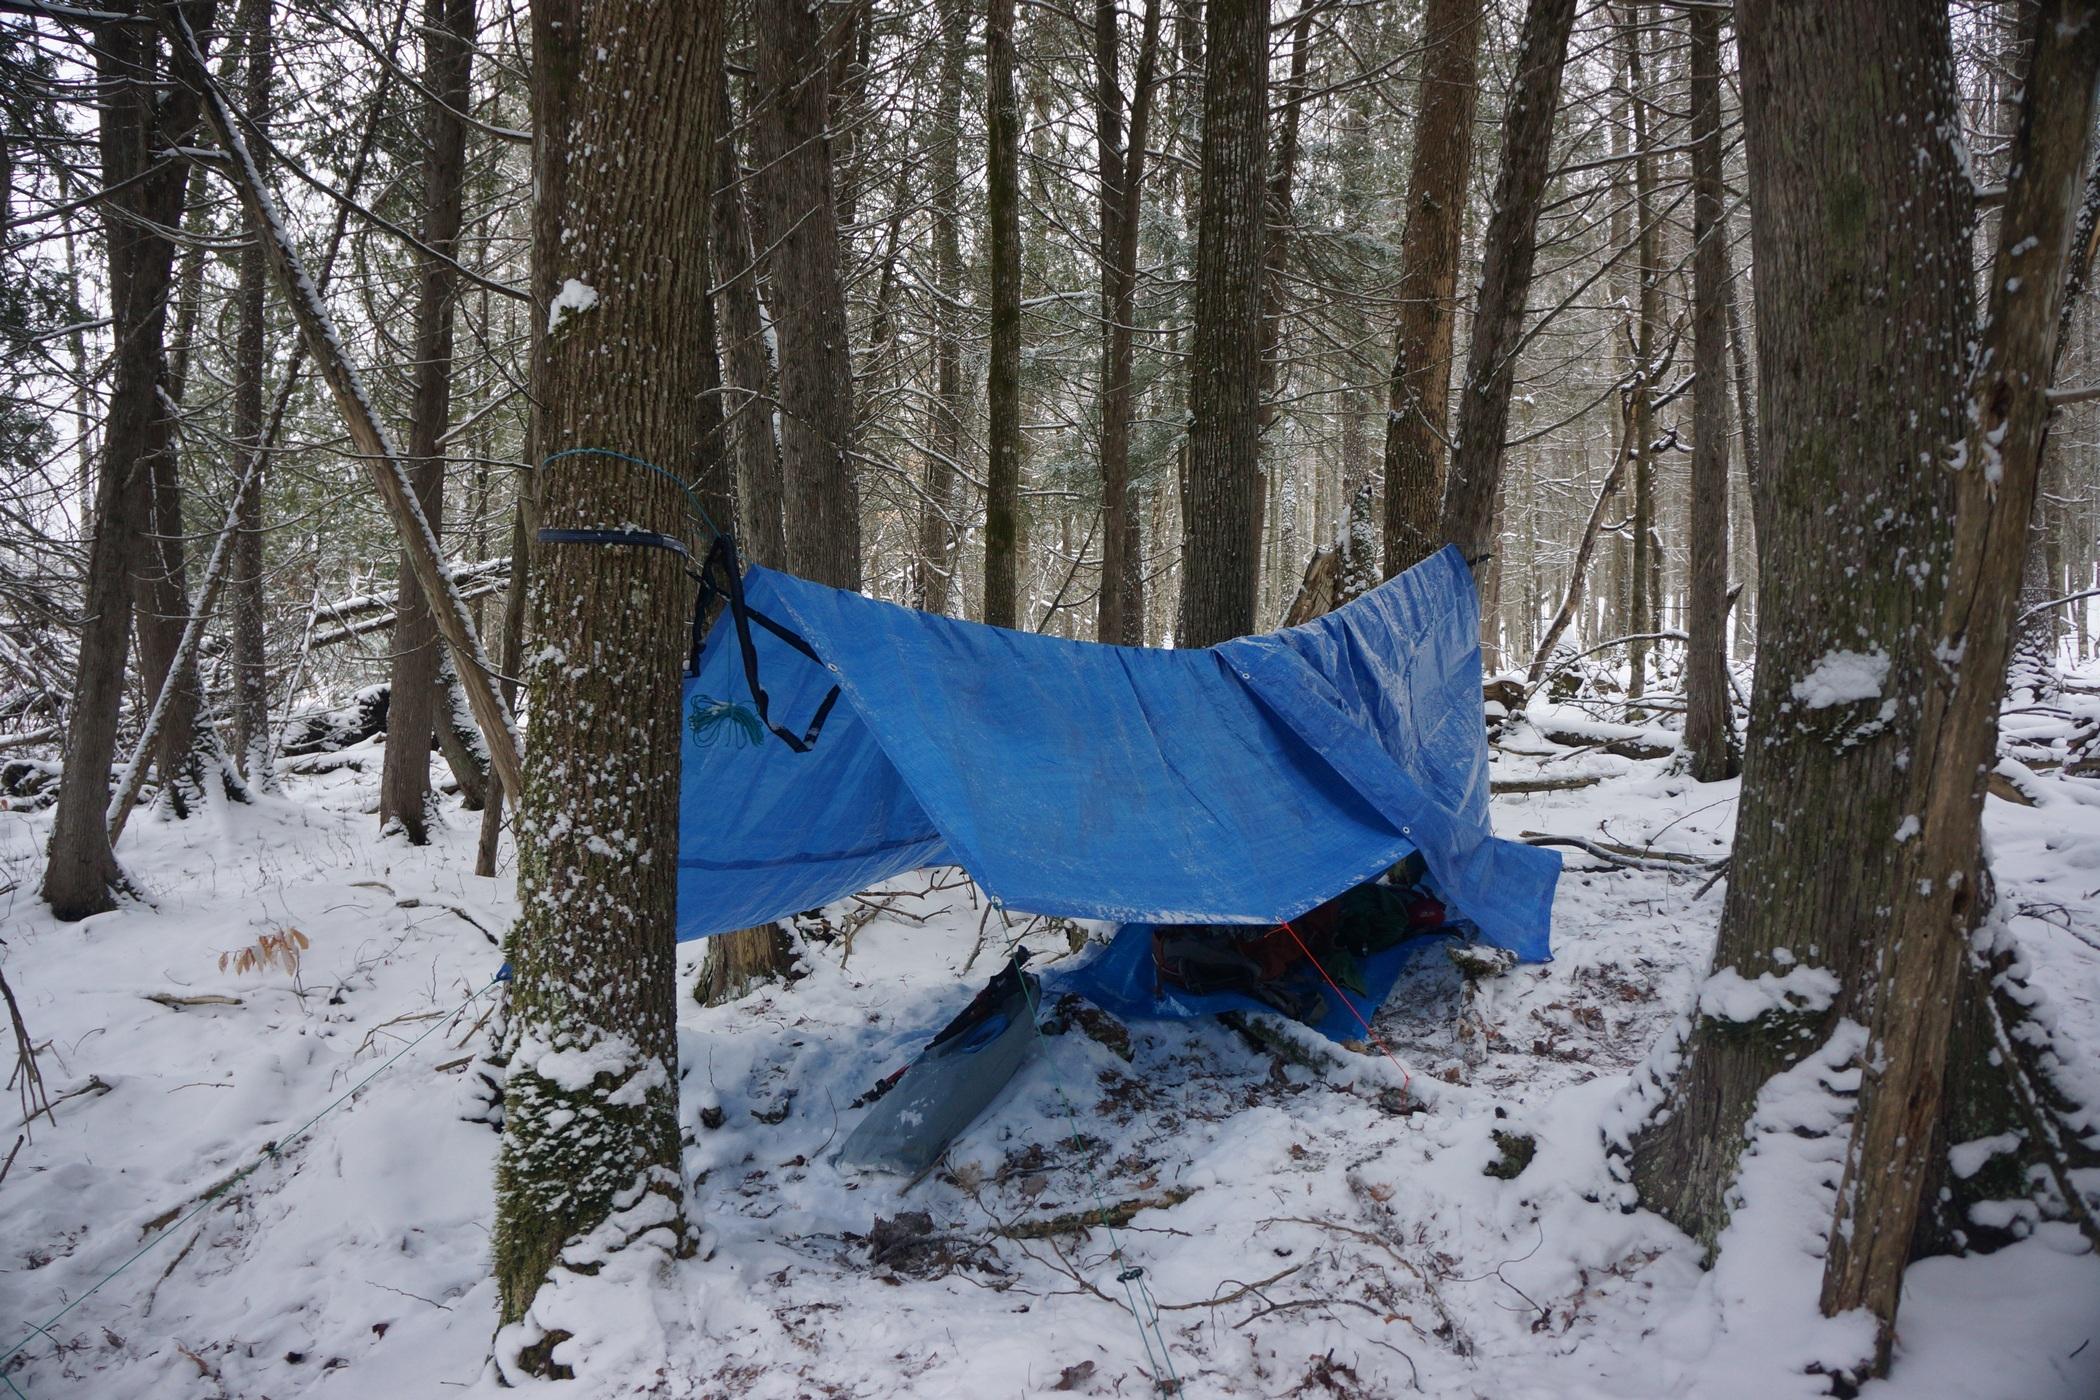 Winter Hiking Archives Seeking Lost Hiking